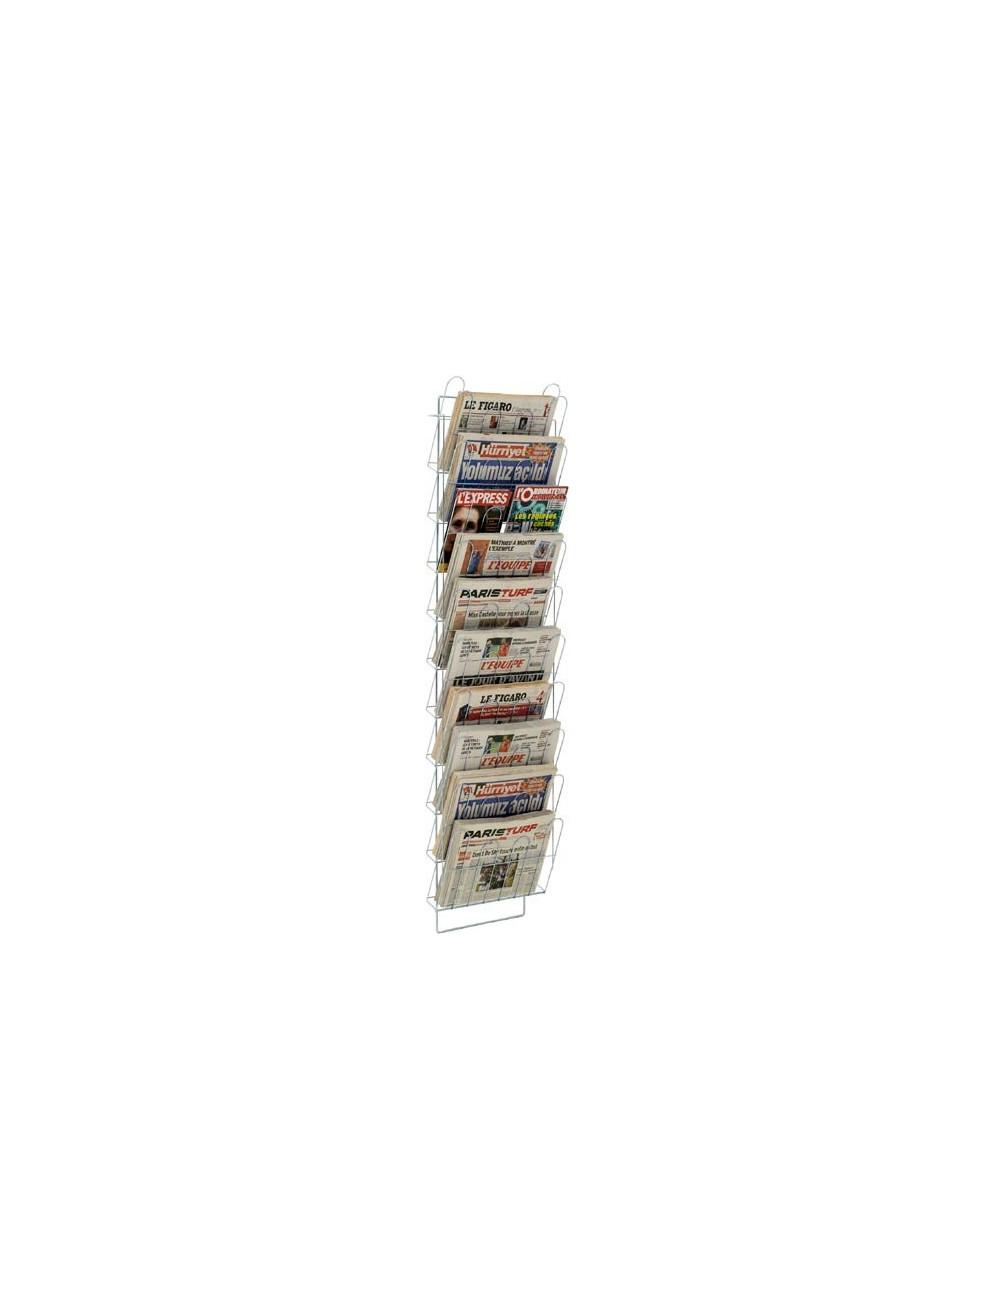 Echelle murale journaux 15 cases